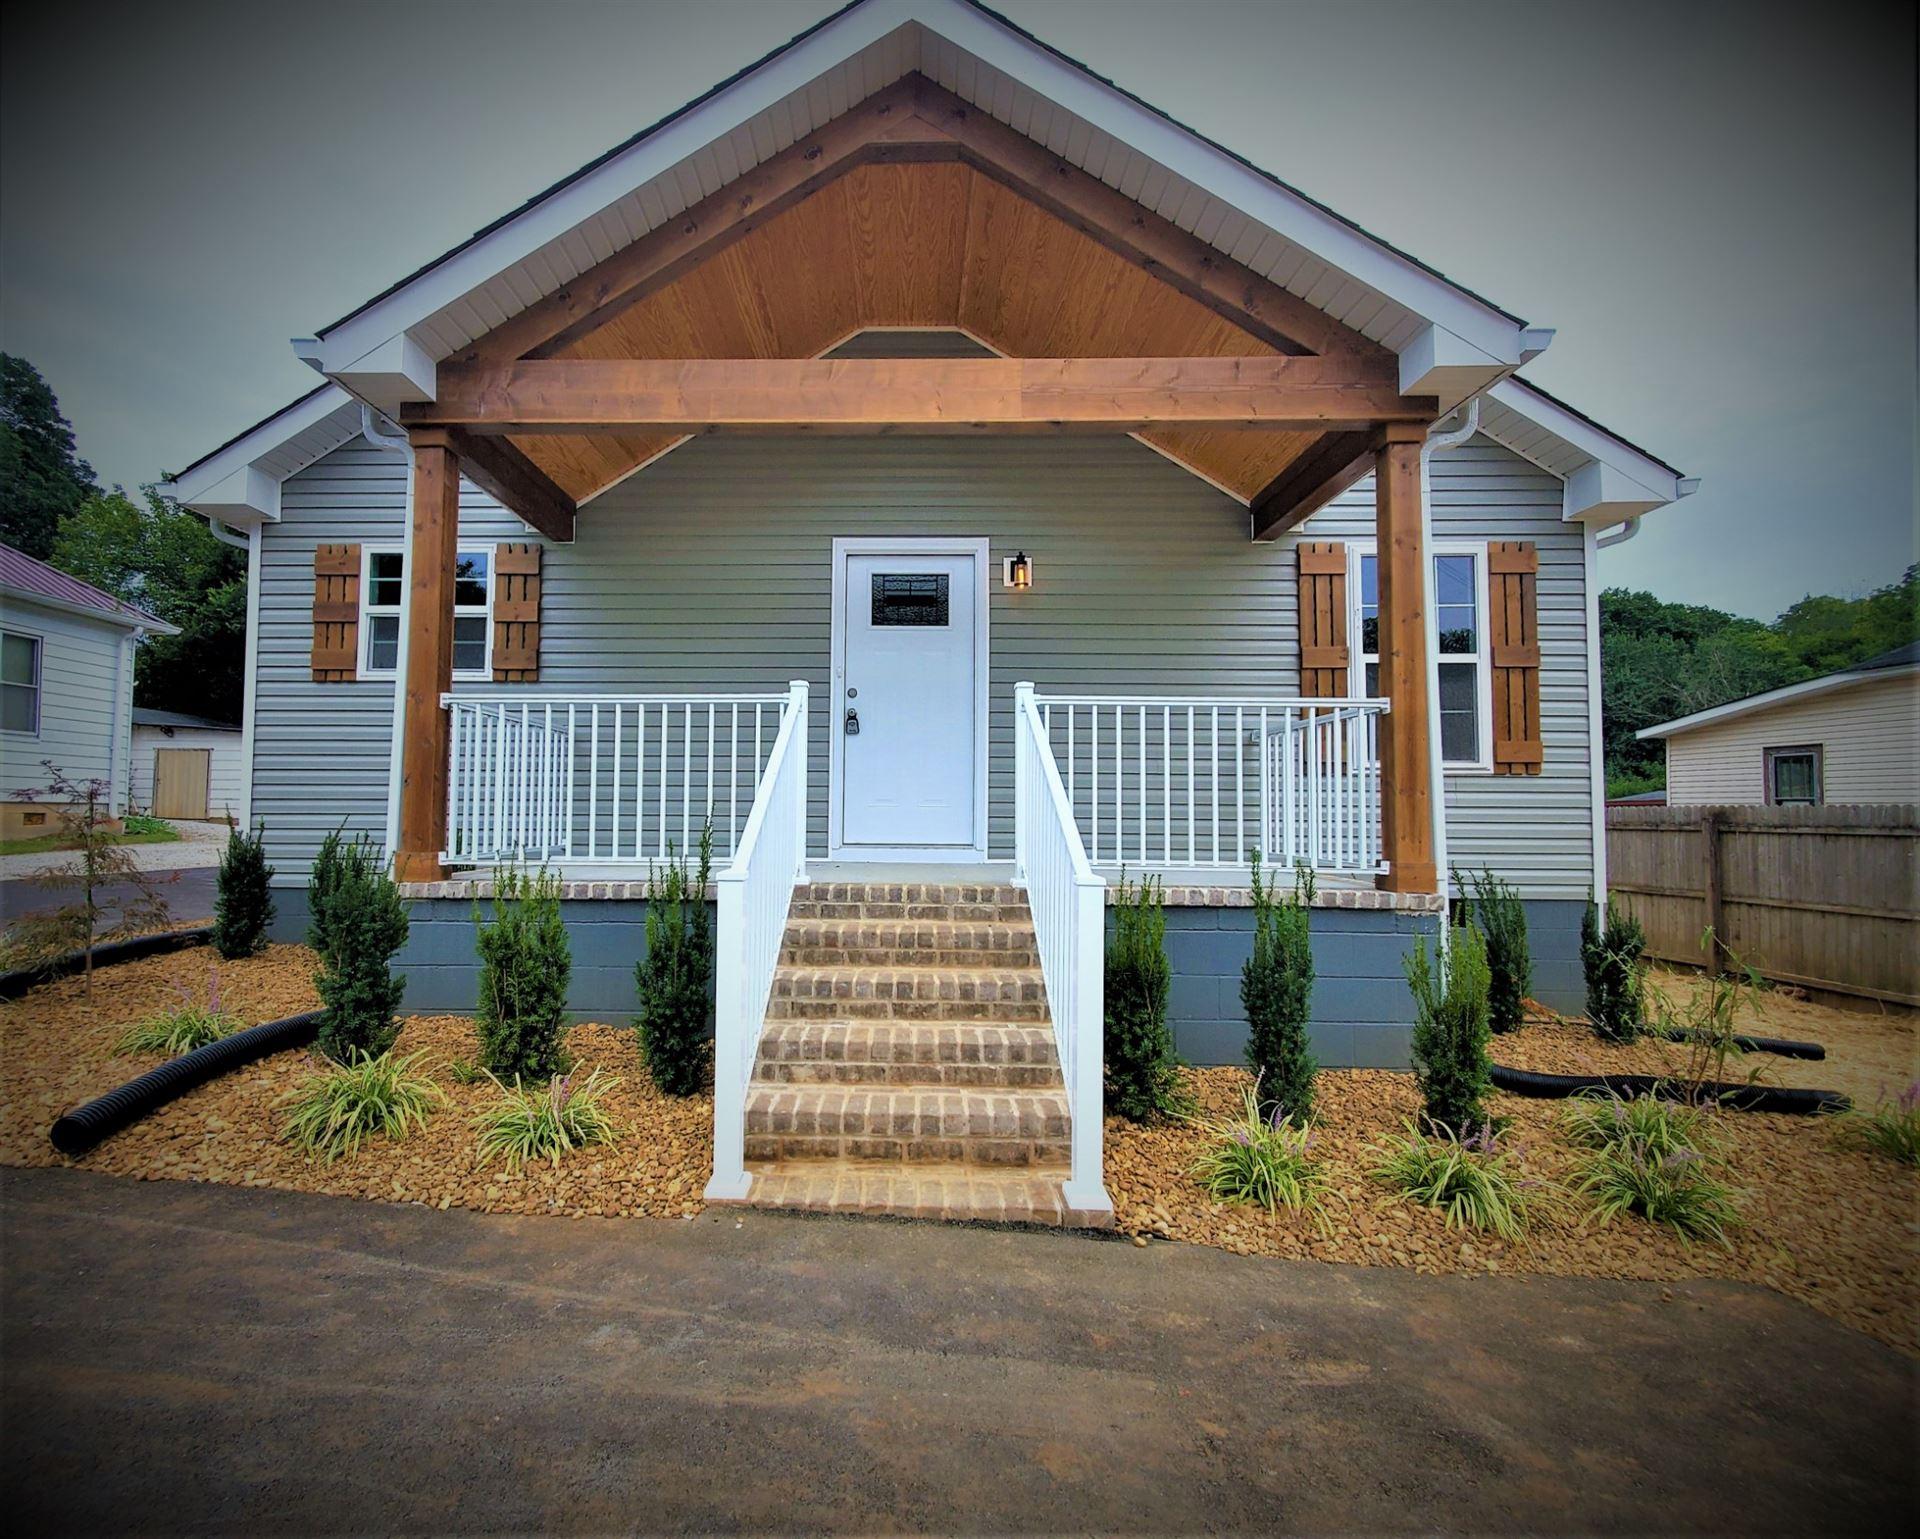 109 Warren St, McMinnville, TN 37110 - MLS#: 2288499